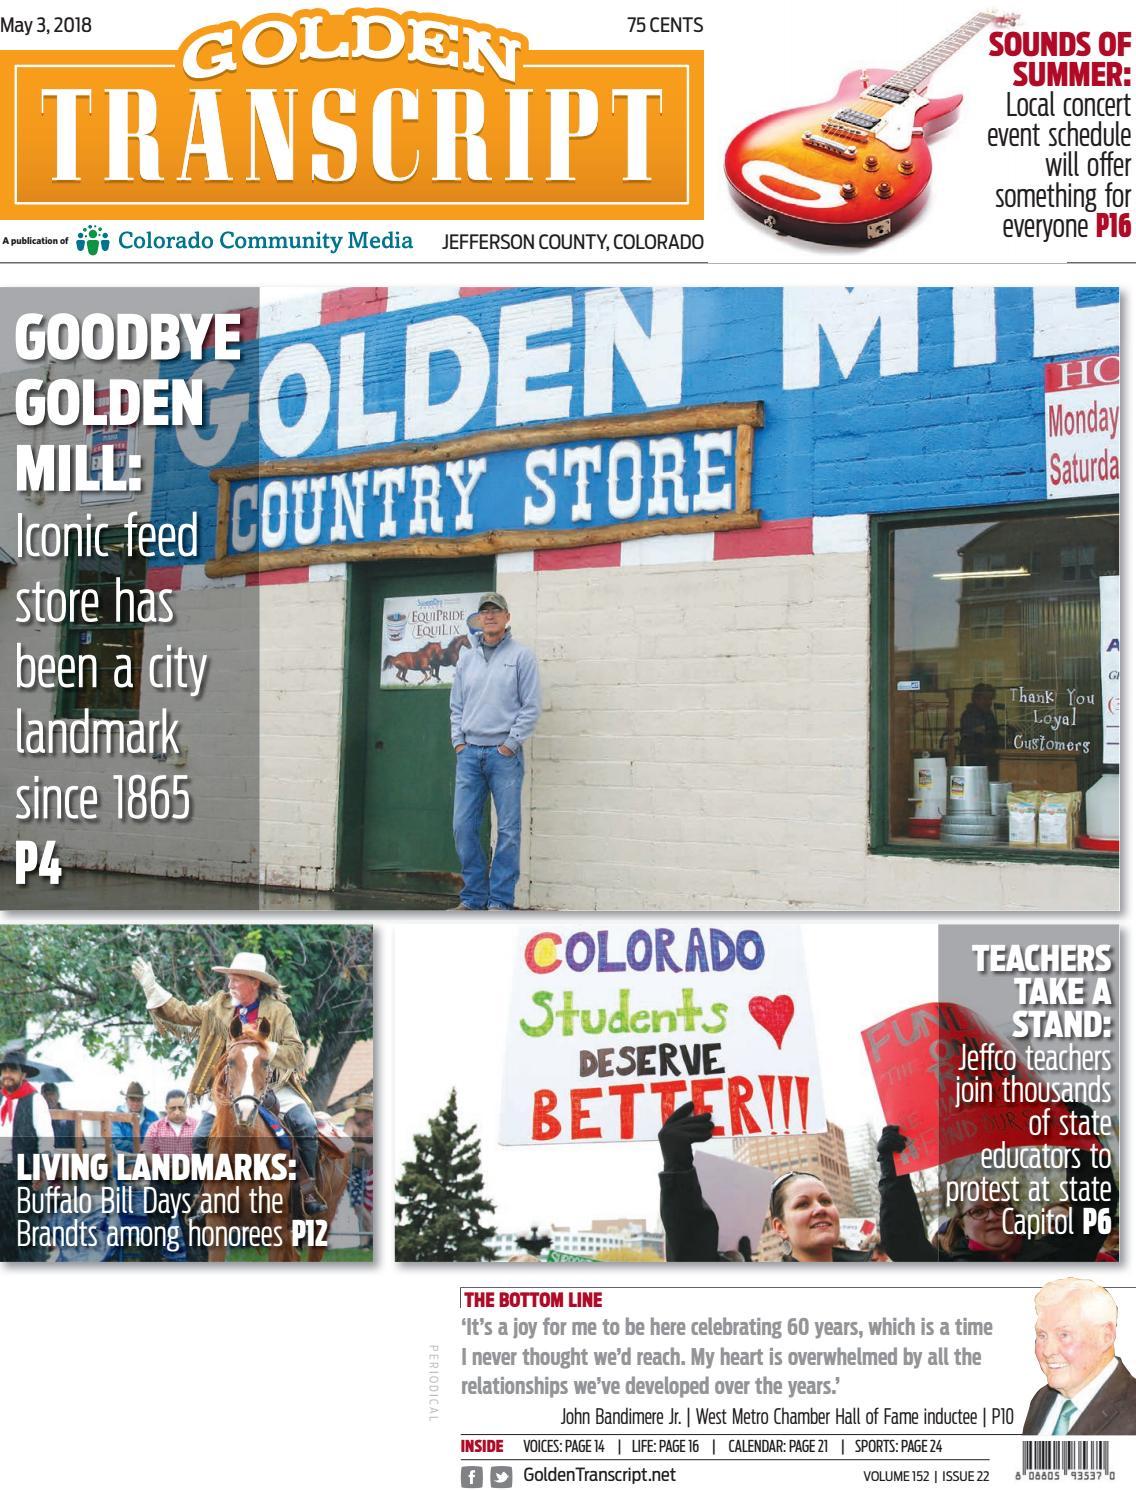 Golden Transcript 0503 By Colorado Community Media Issuu Cheap Rv Livingcom Basic 12 Volt Wiring How To Install A Led Light